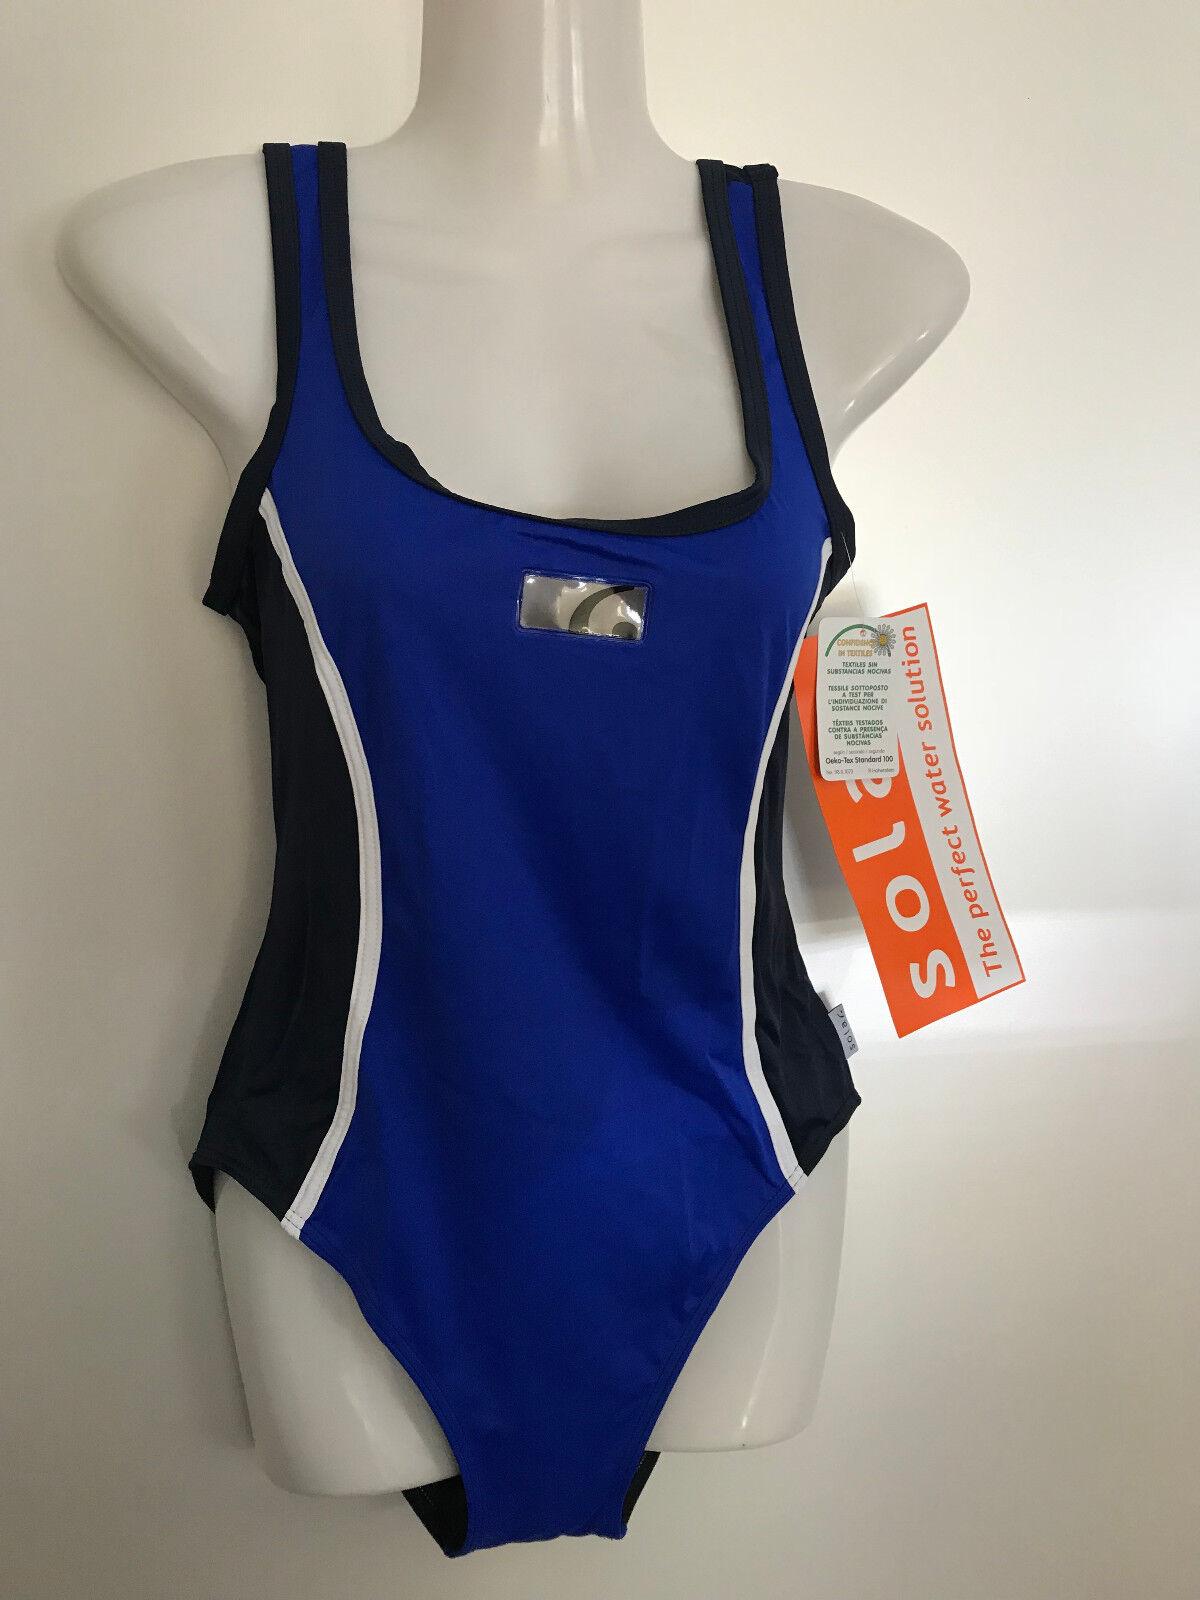 Solar Schöner Sport Badeanzug , Wettkampf Gr 38 Neu